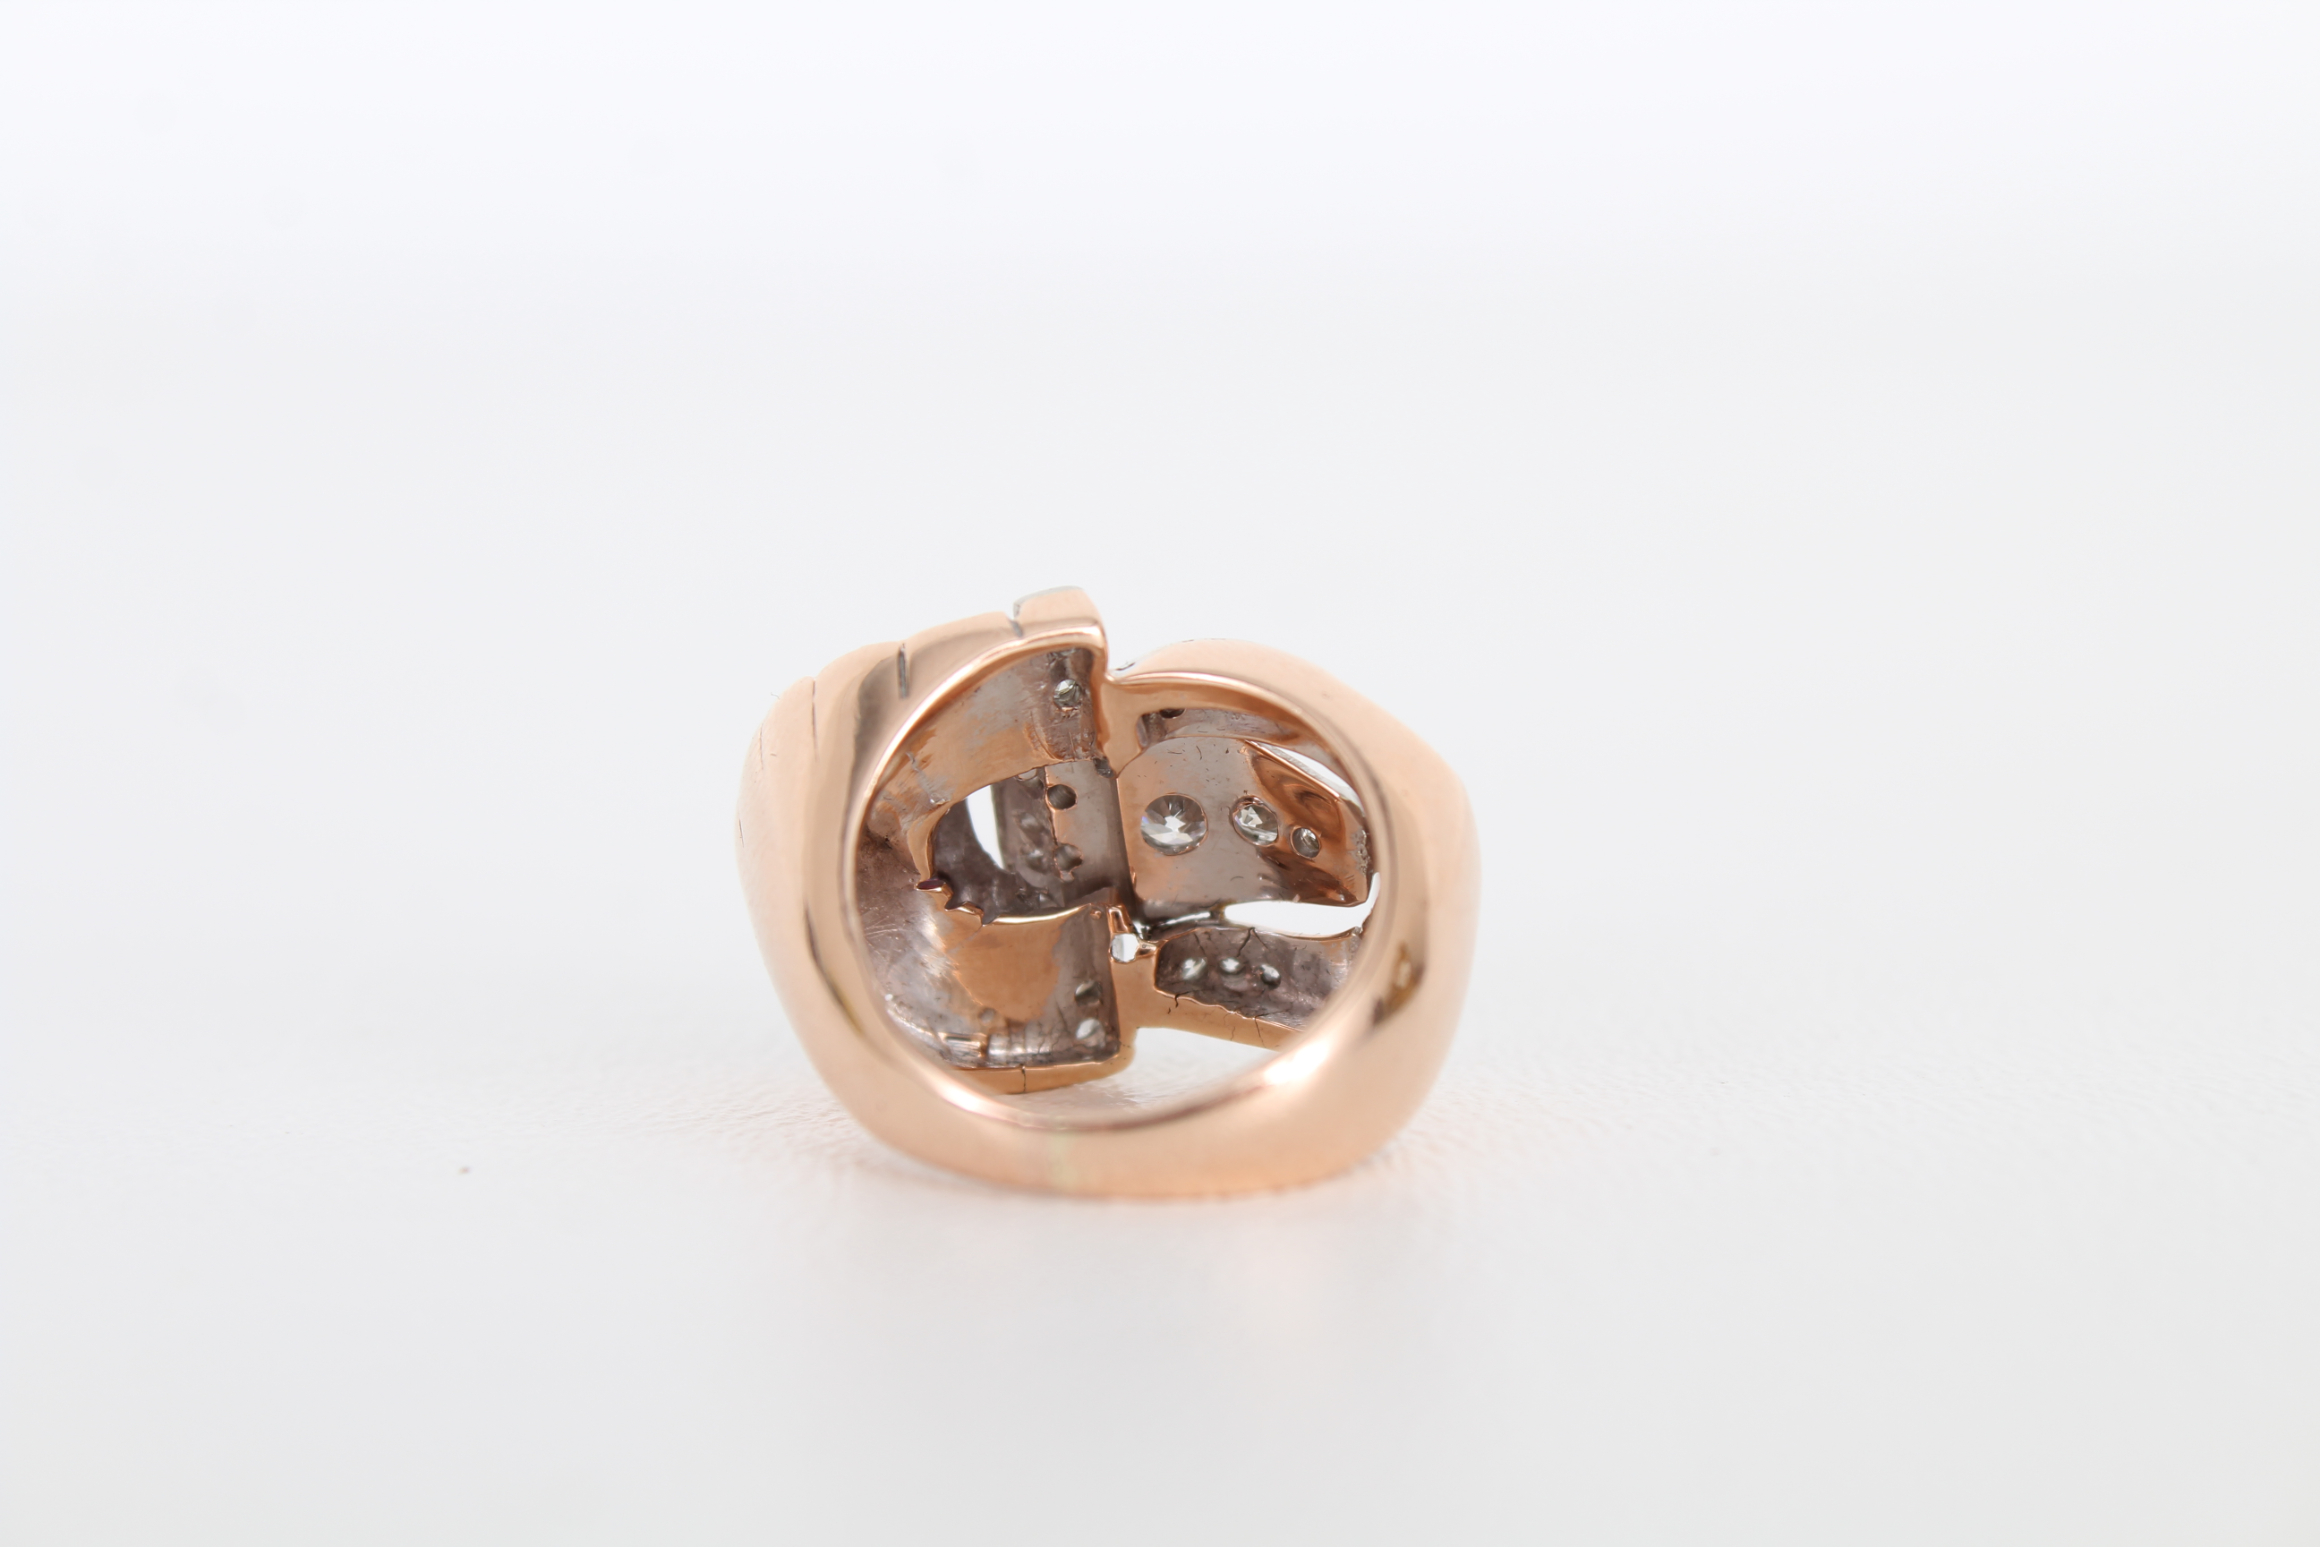 14K Ruby & Diamond Gold Ring - Image 6 of 7